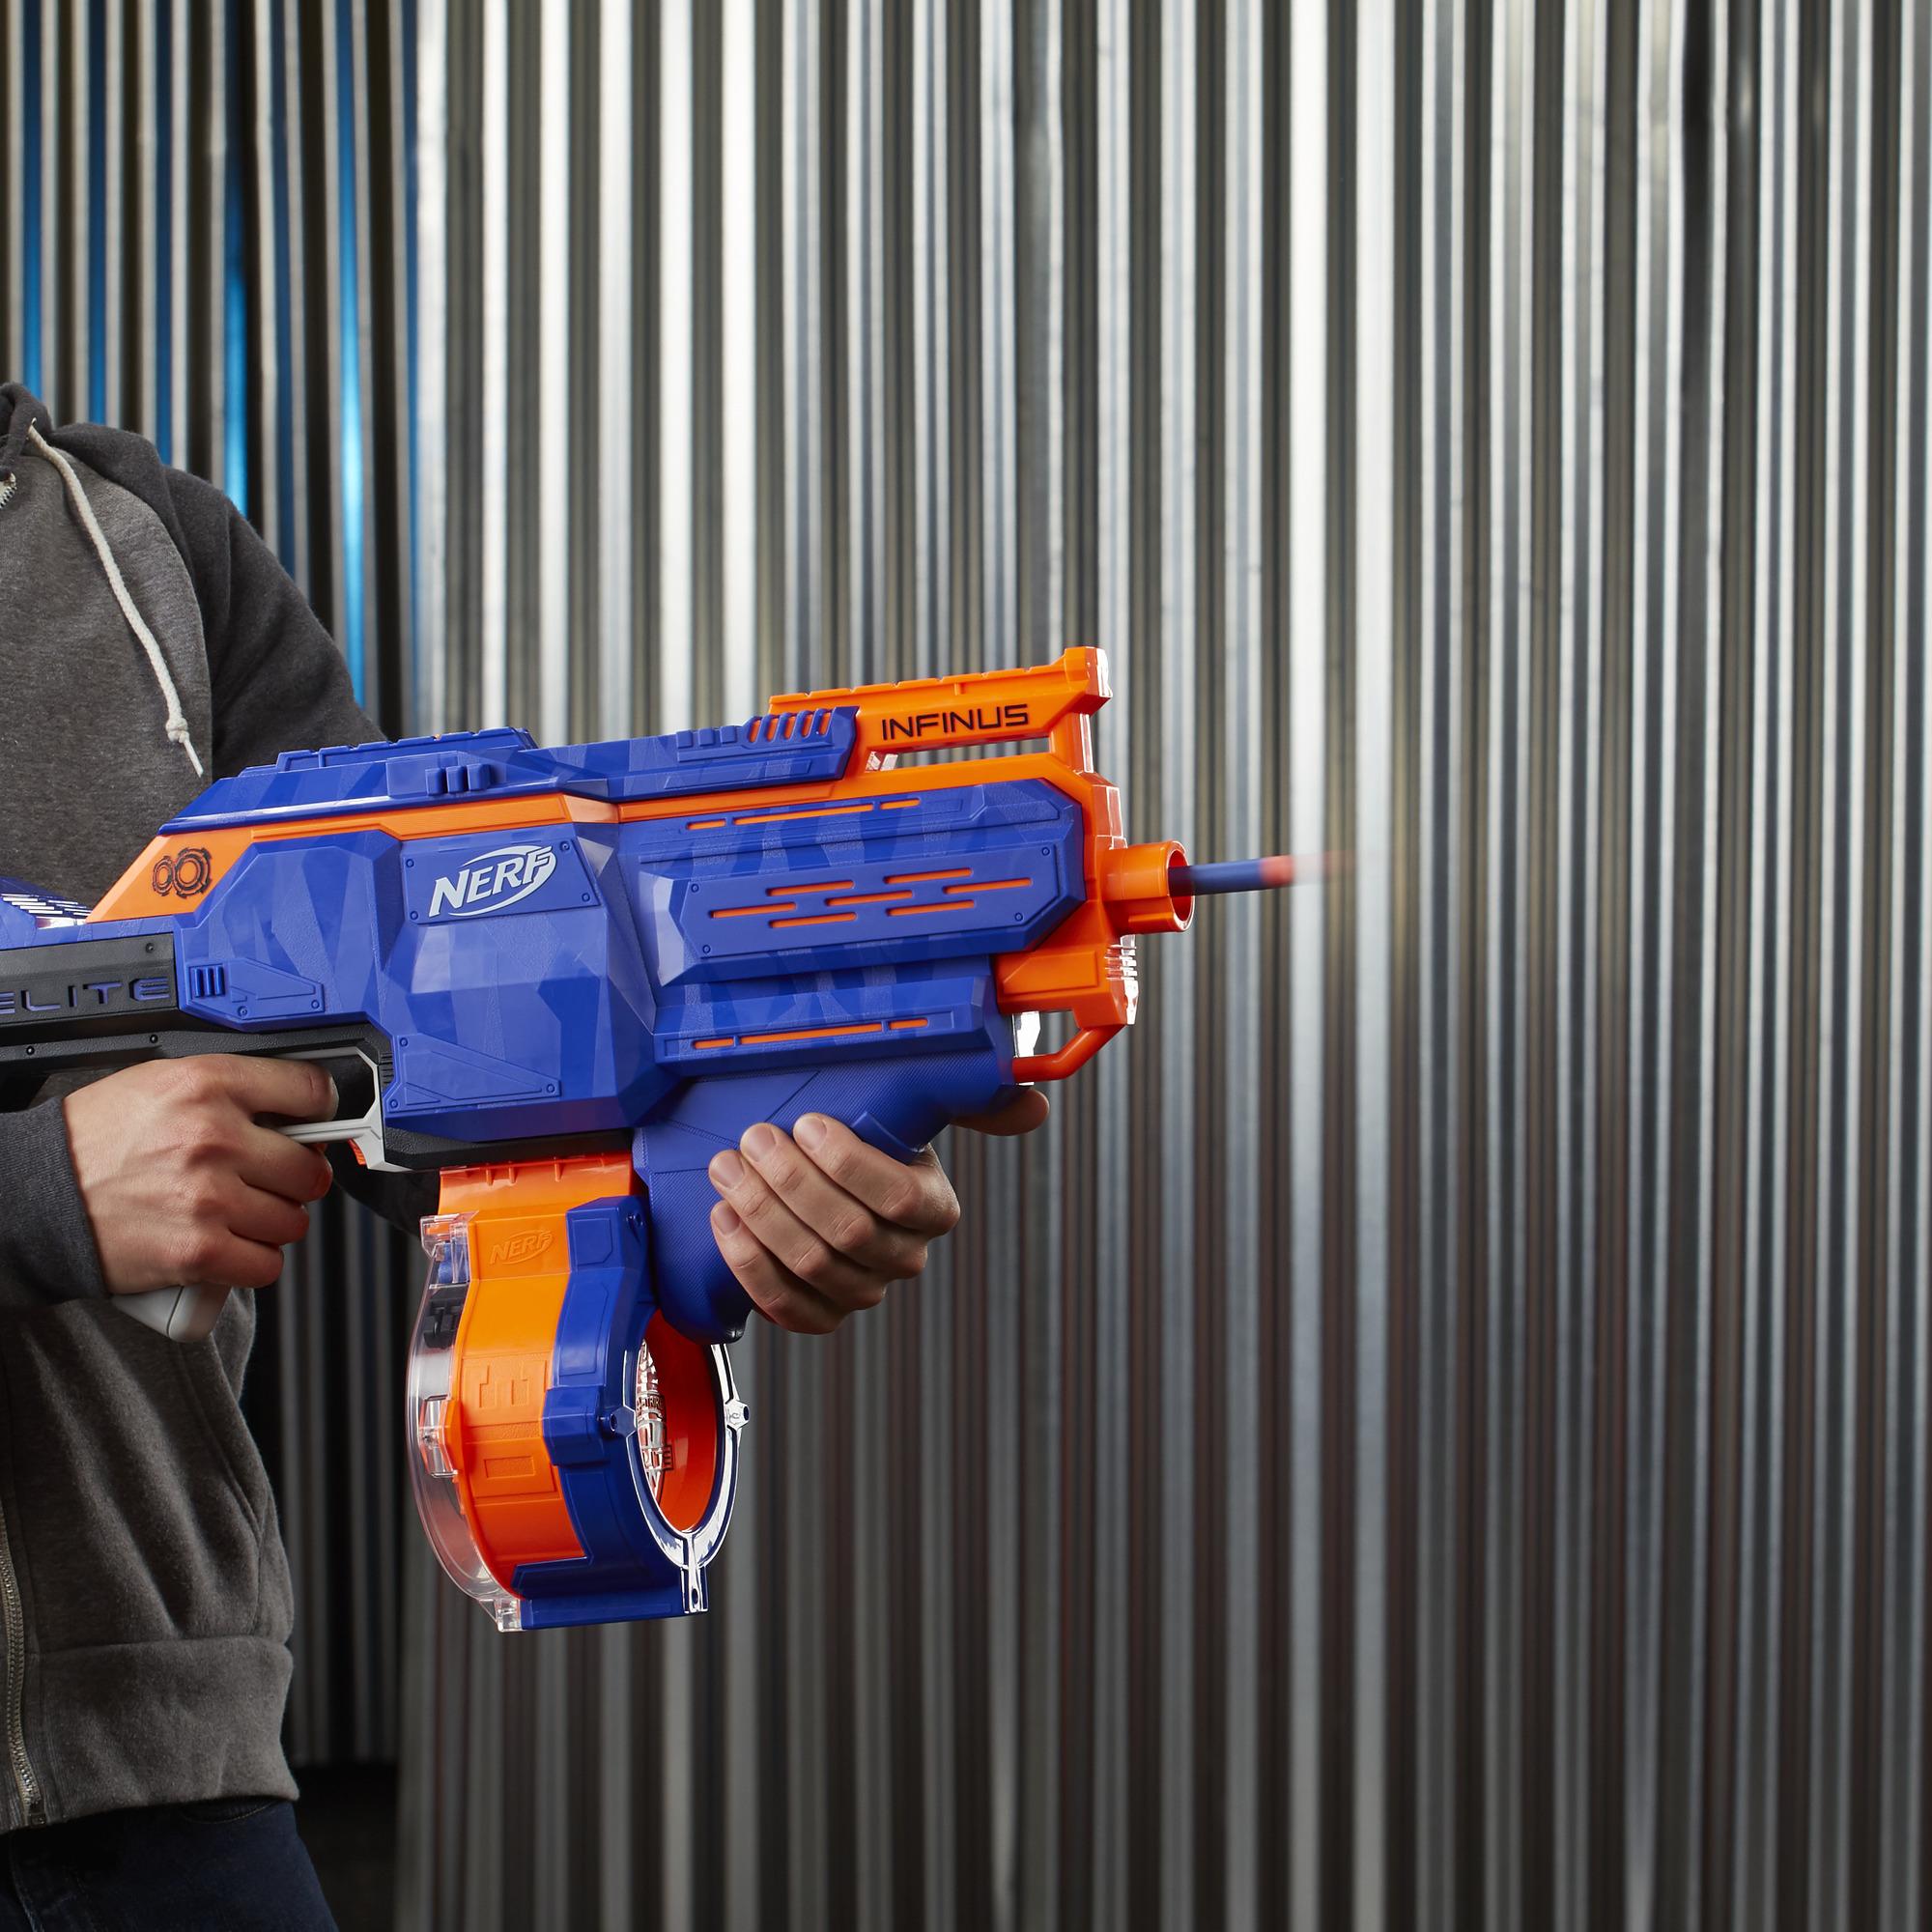 Nerf N-strike Elite Infinus with Speed-Load Tech 30-Dart Drum 30 Nerf Darts